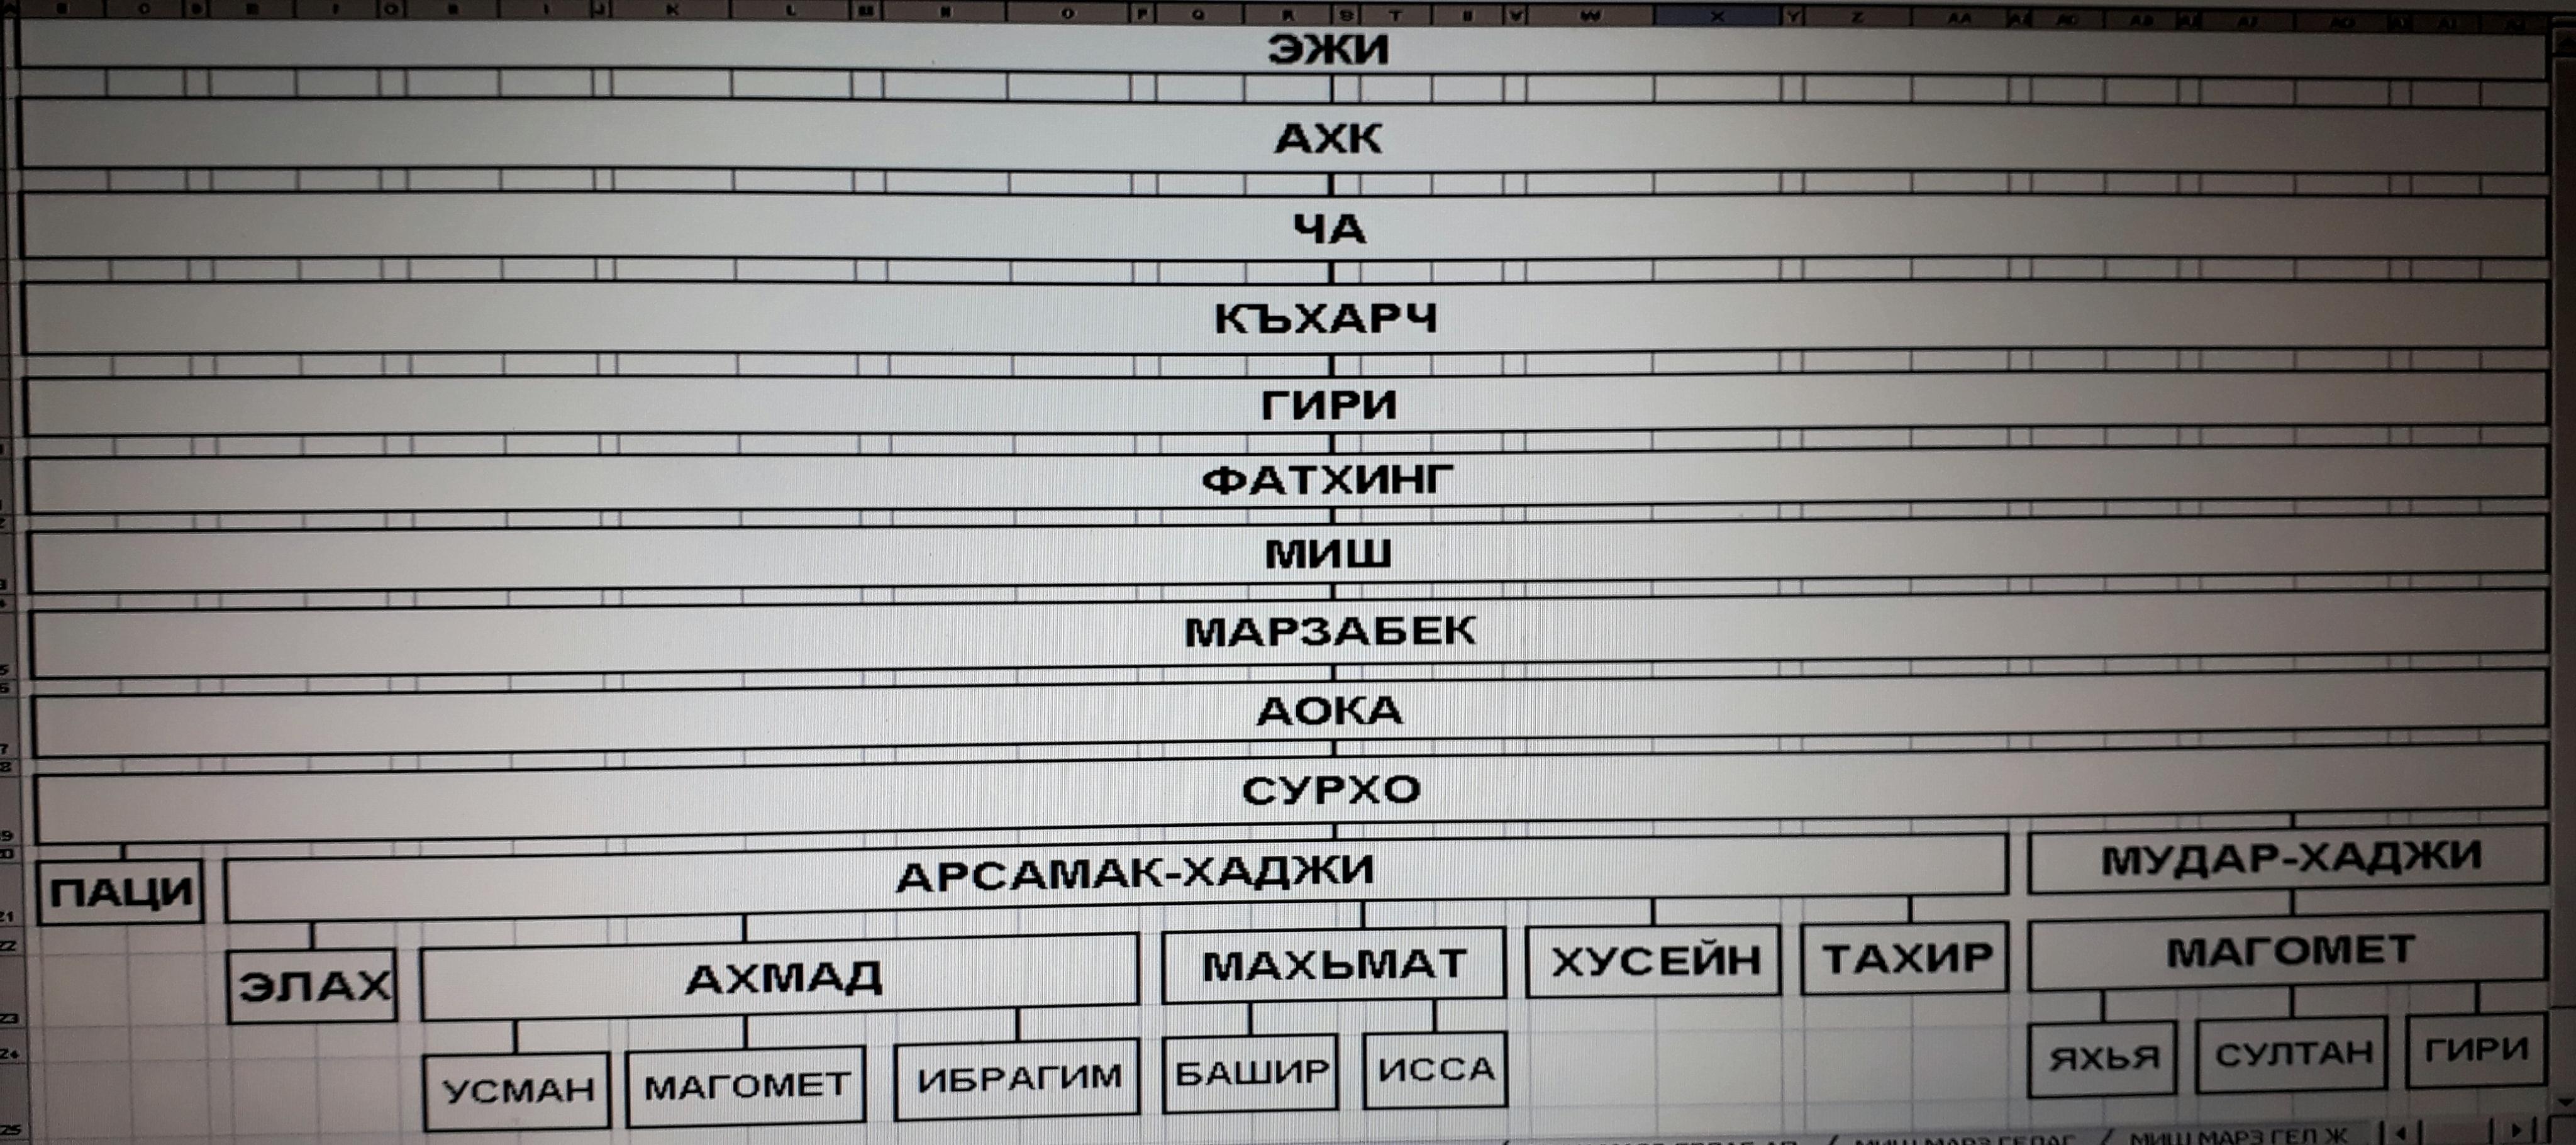 http://s0.uploads.ru/ma2Gv.jpg